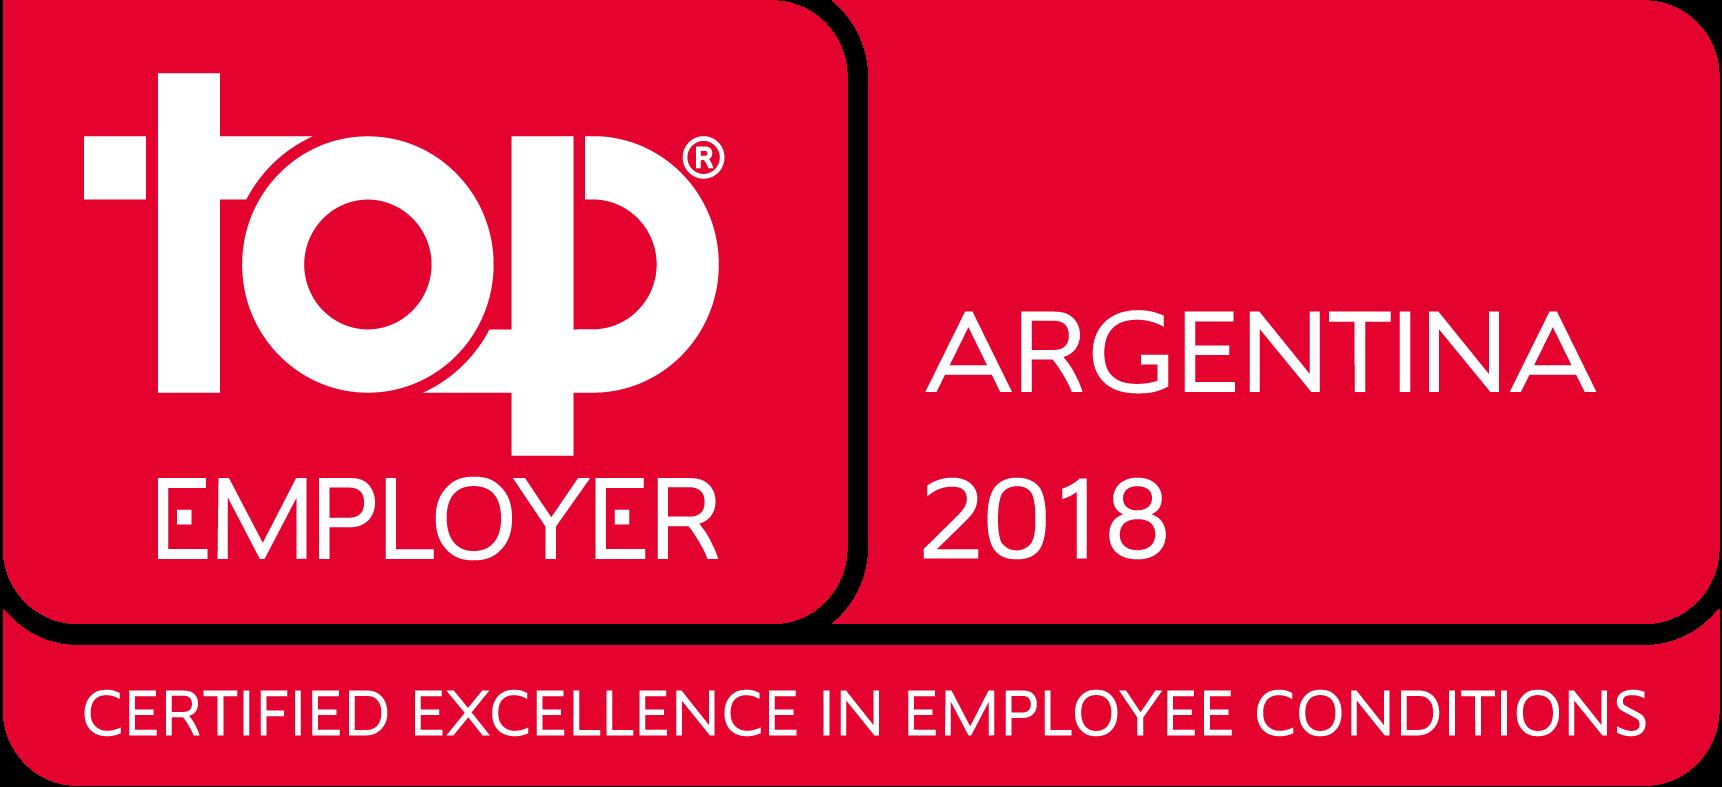 Top_Employer_Argentina_2018